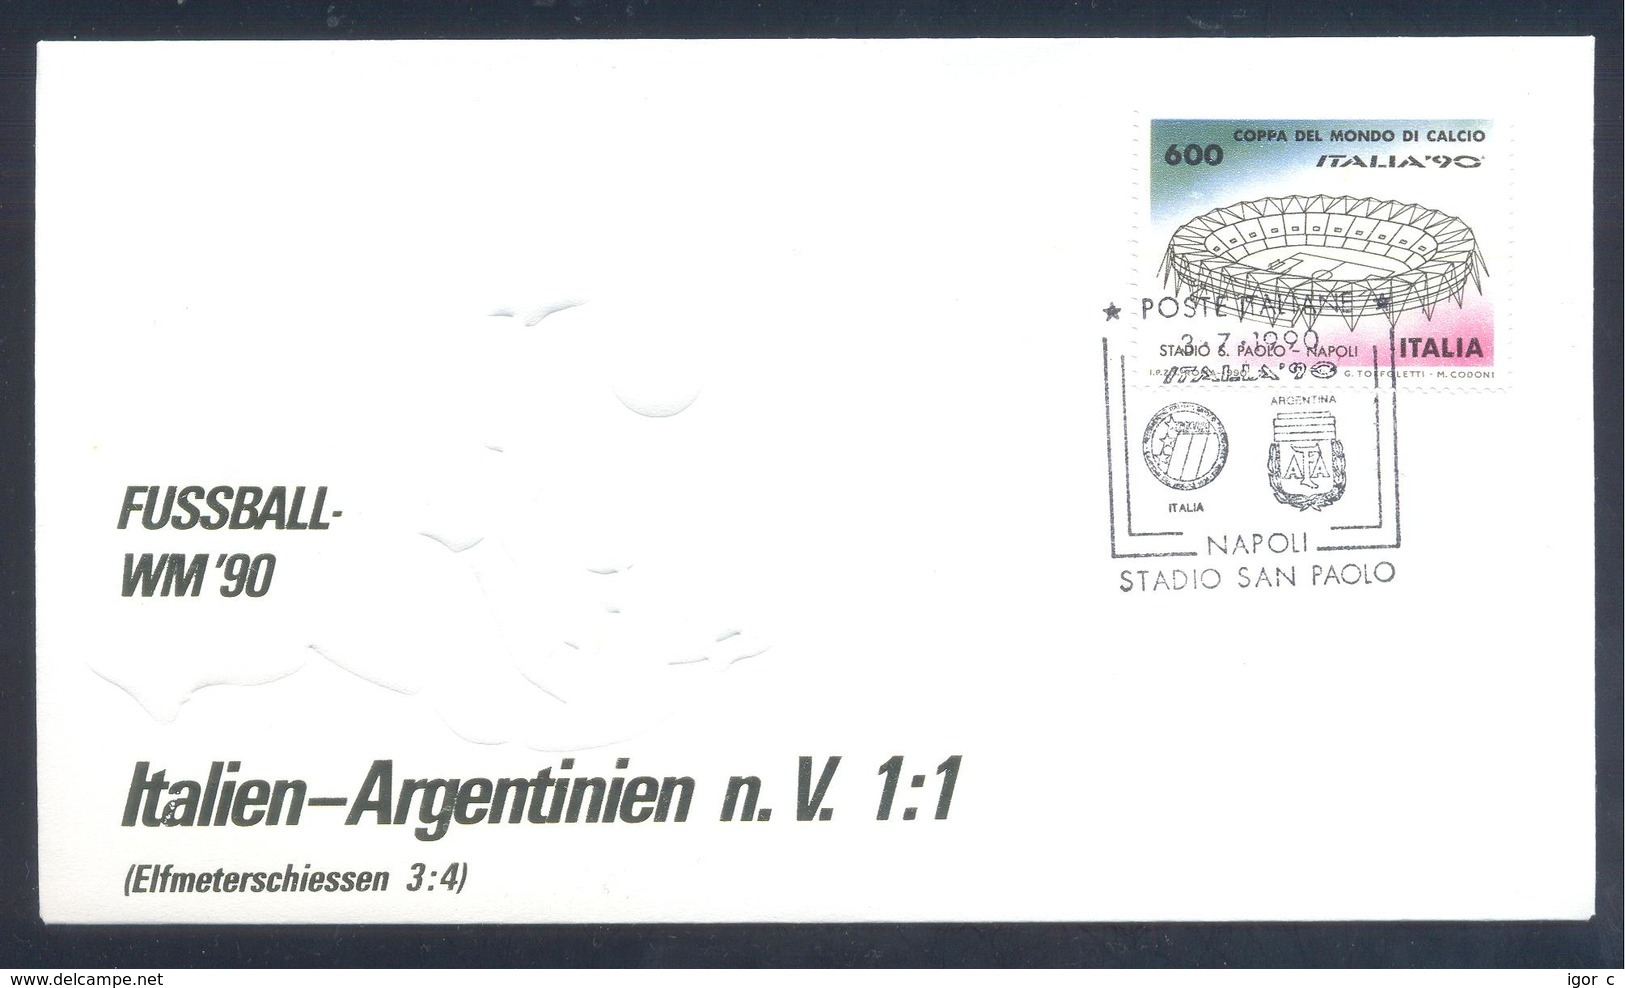 Italy 1990 Cover: Football Fussball Soccer Calcio: Fifa World Cup Italia 90; Italy - Argentina, Stadio San Paolo Napoli - Wereldkampioenschap